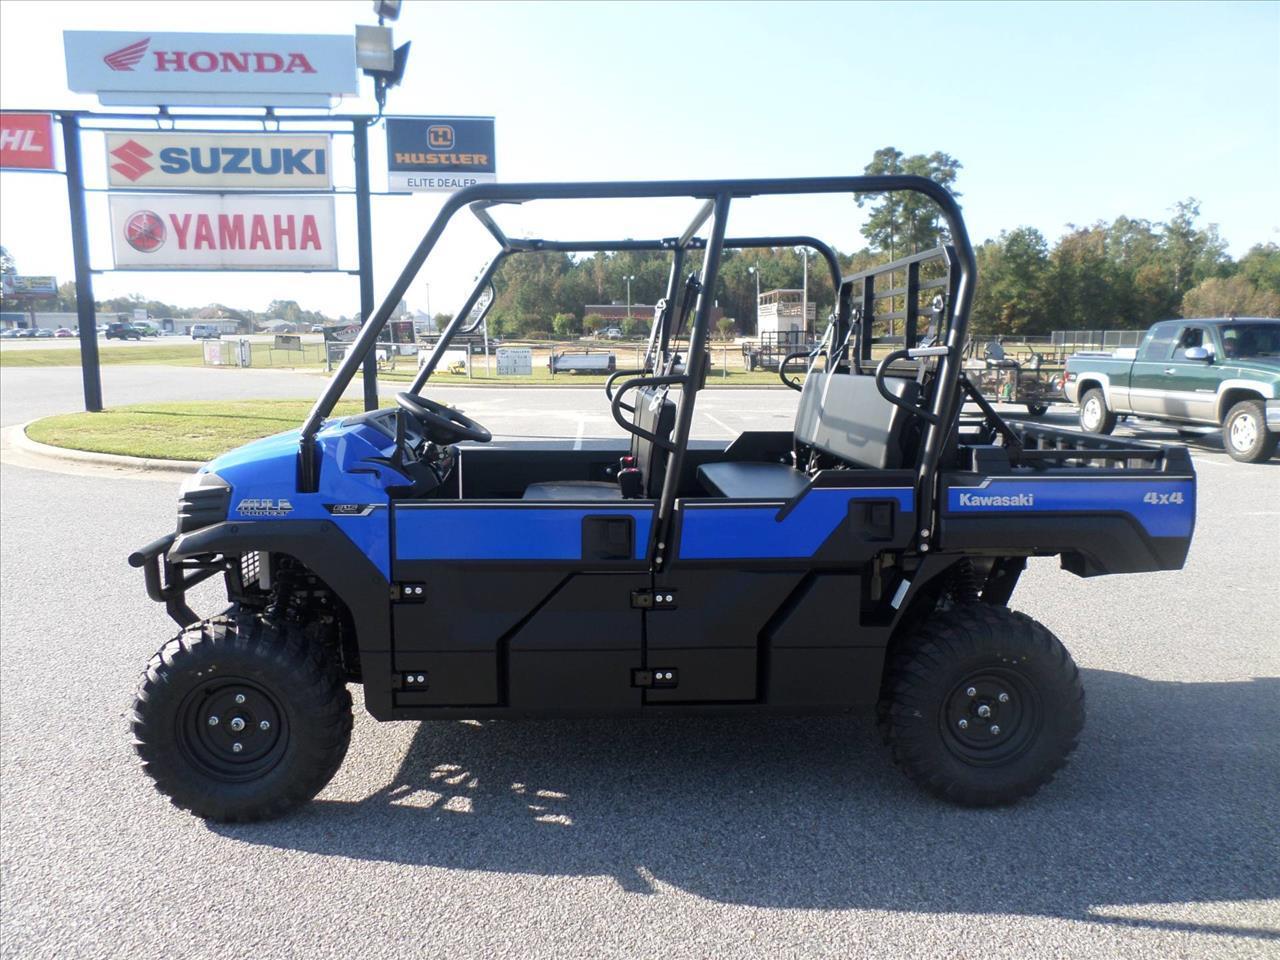 2017 Kawasaki Mule for sale at Vehicle Network, LLC - Ron Ayers Motorsports in Greenville NC